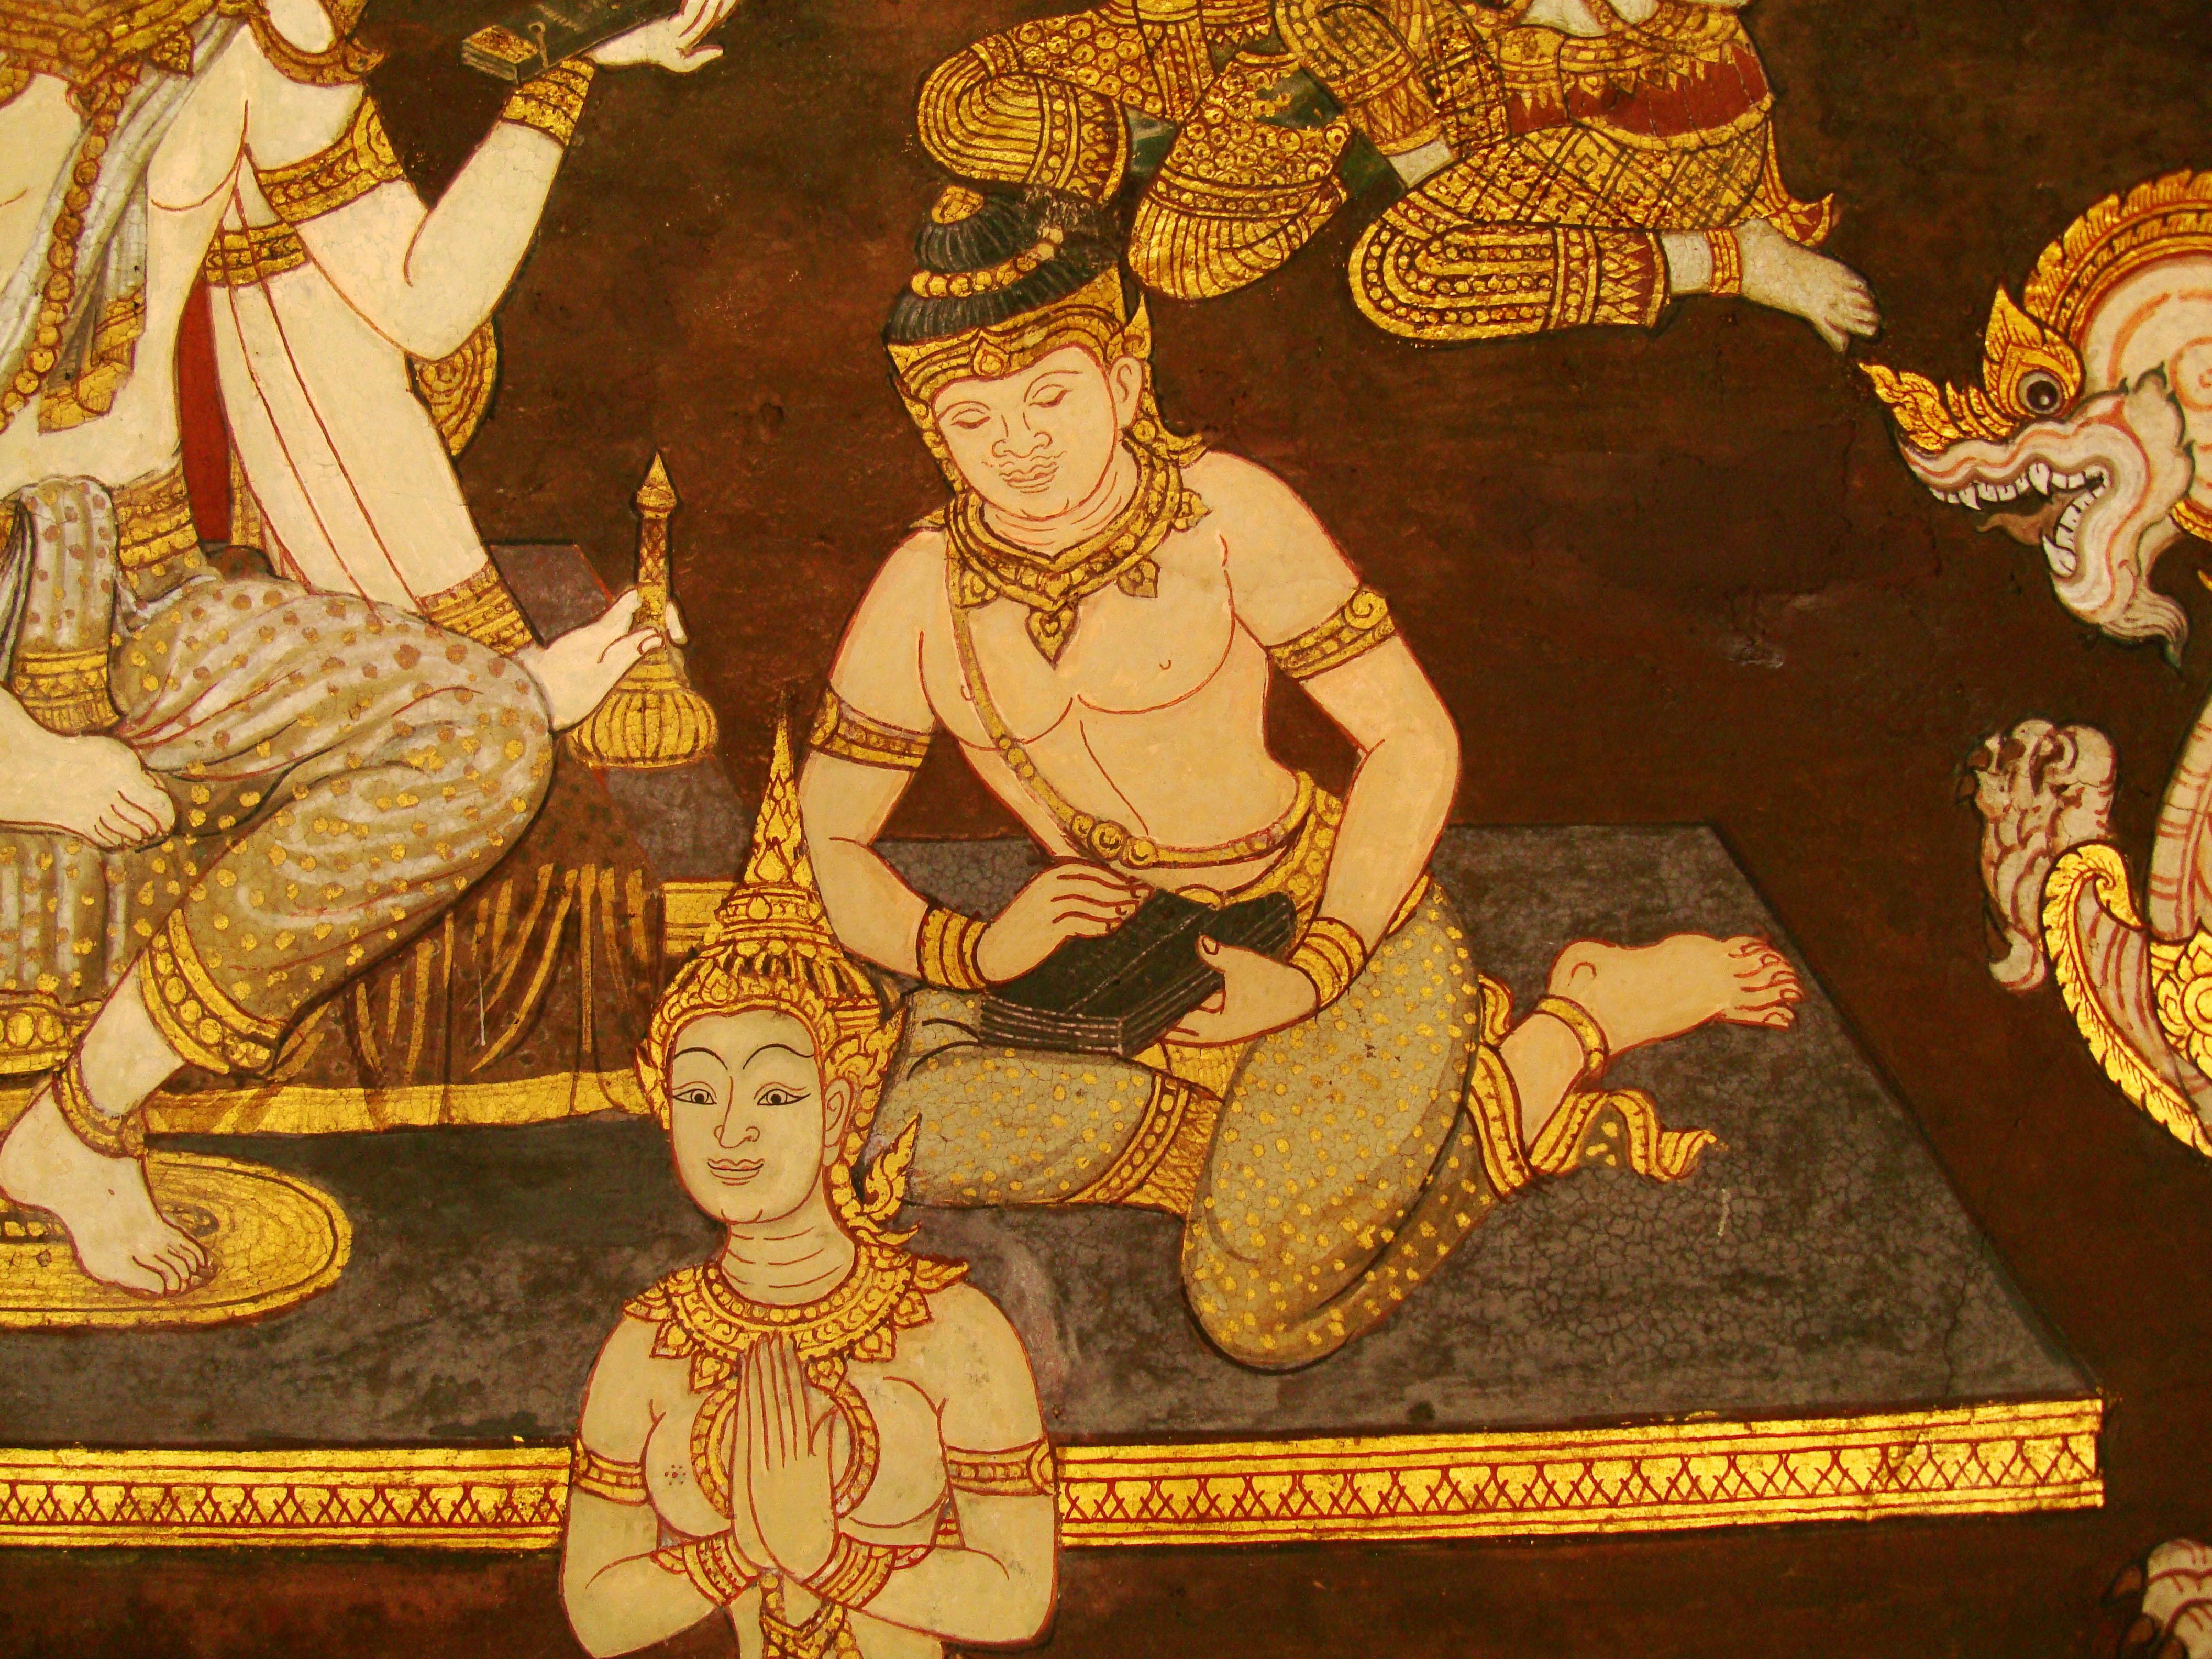 Grand Palace Gold leaf Buddhist artwork Bangkok Thailand 32